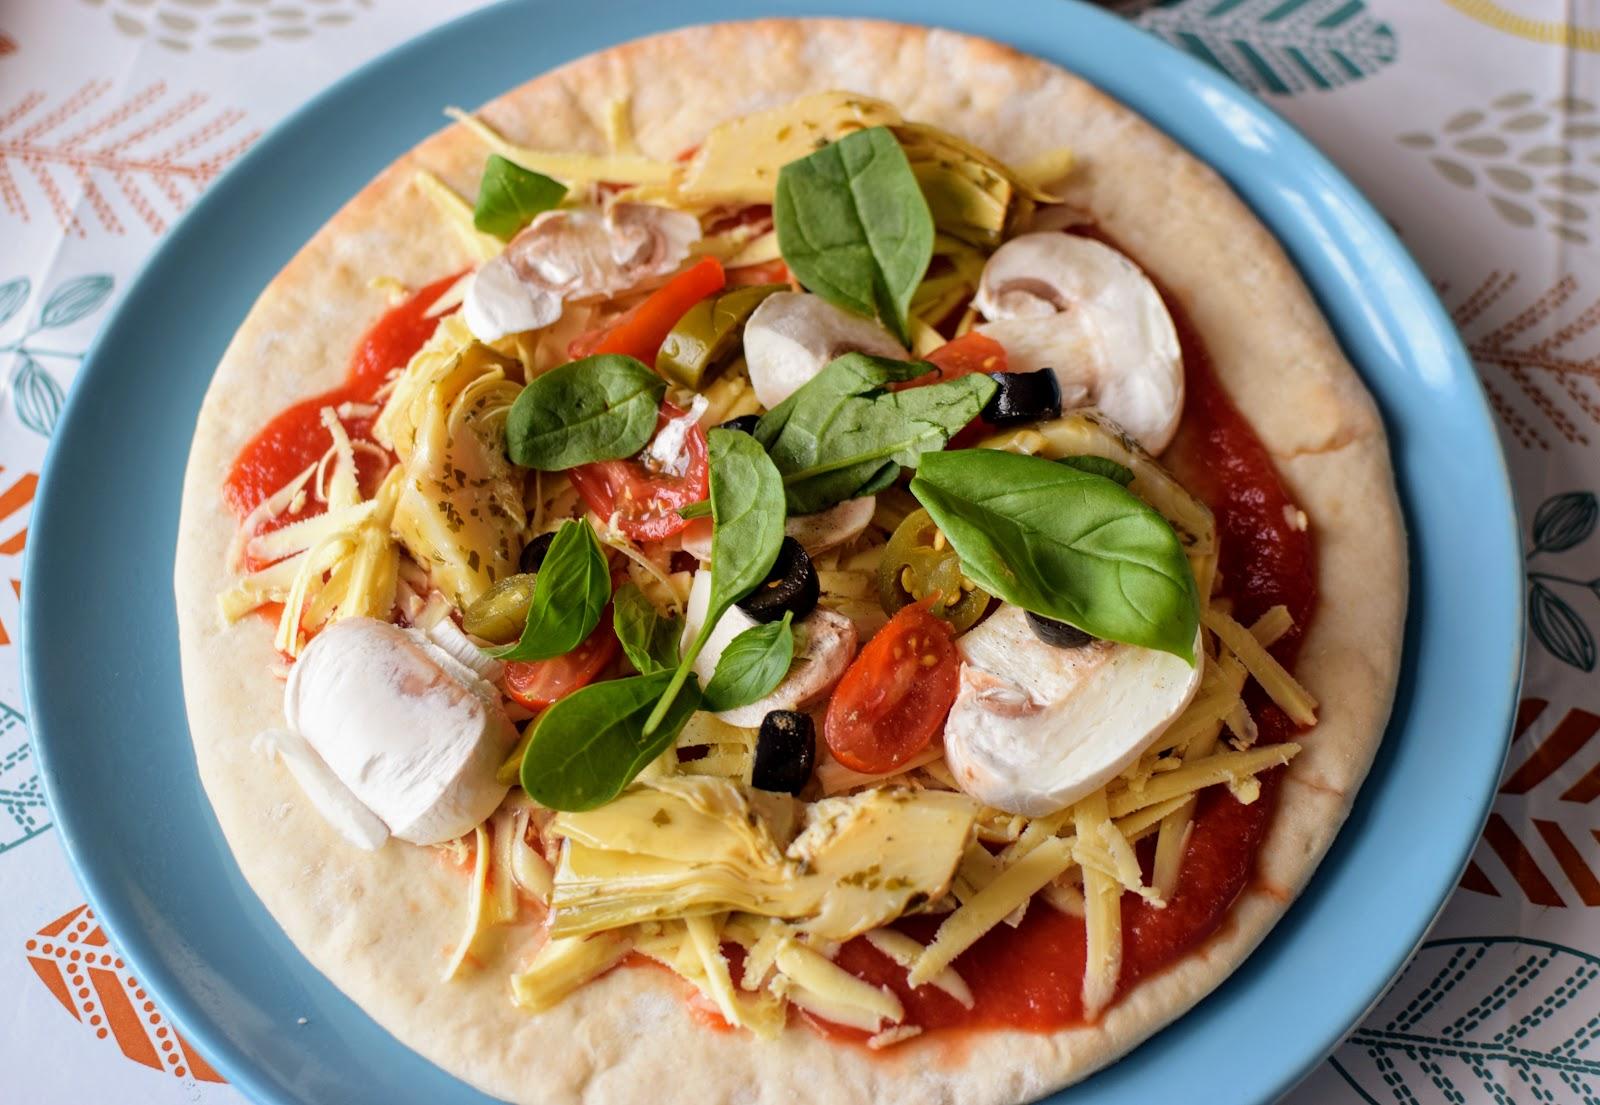 , Food:  Artichoke and Mushroom Vegan Pizza